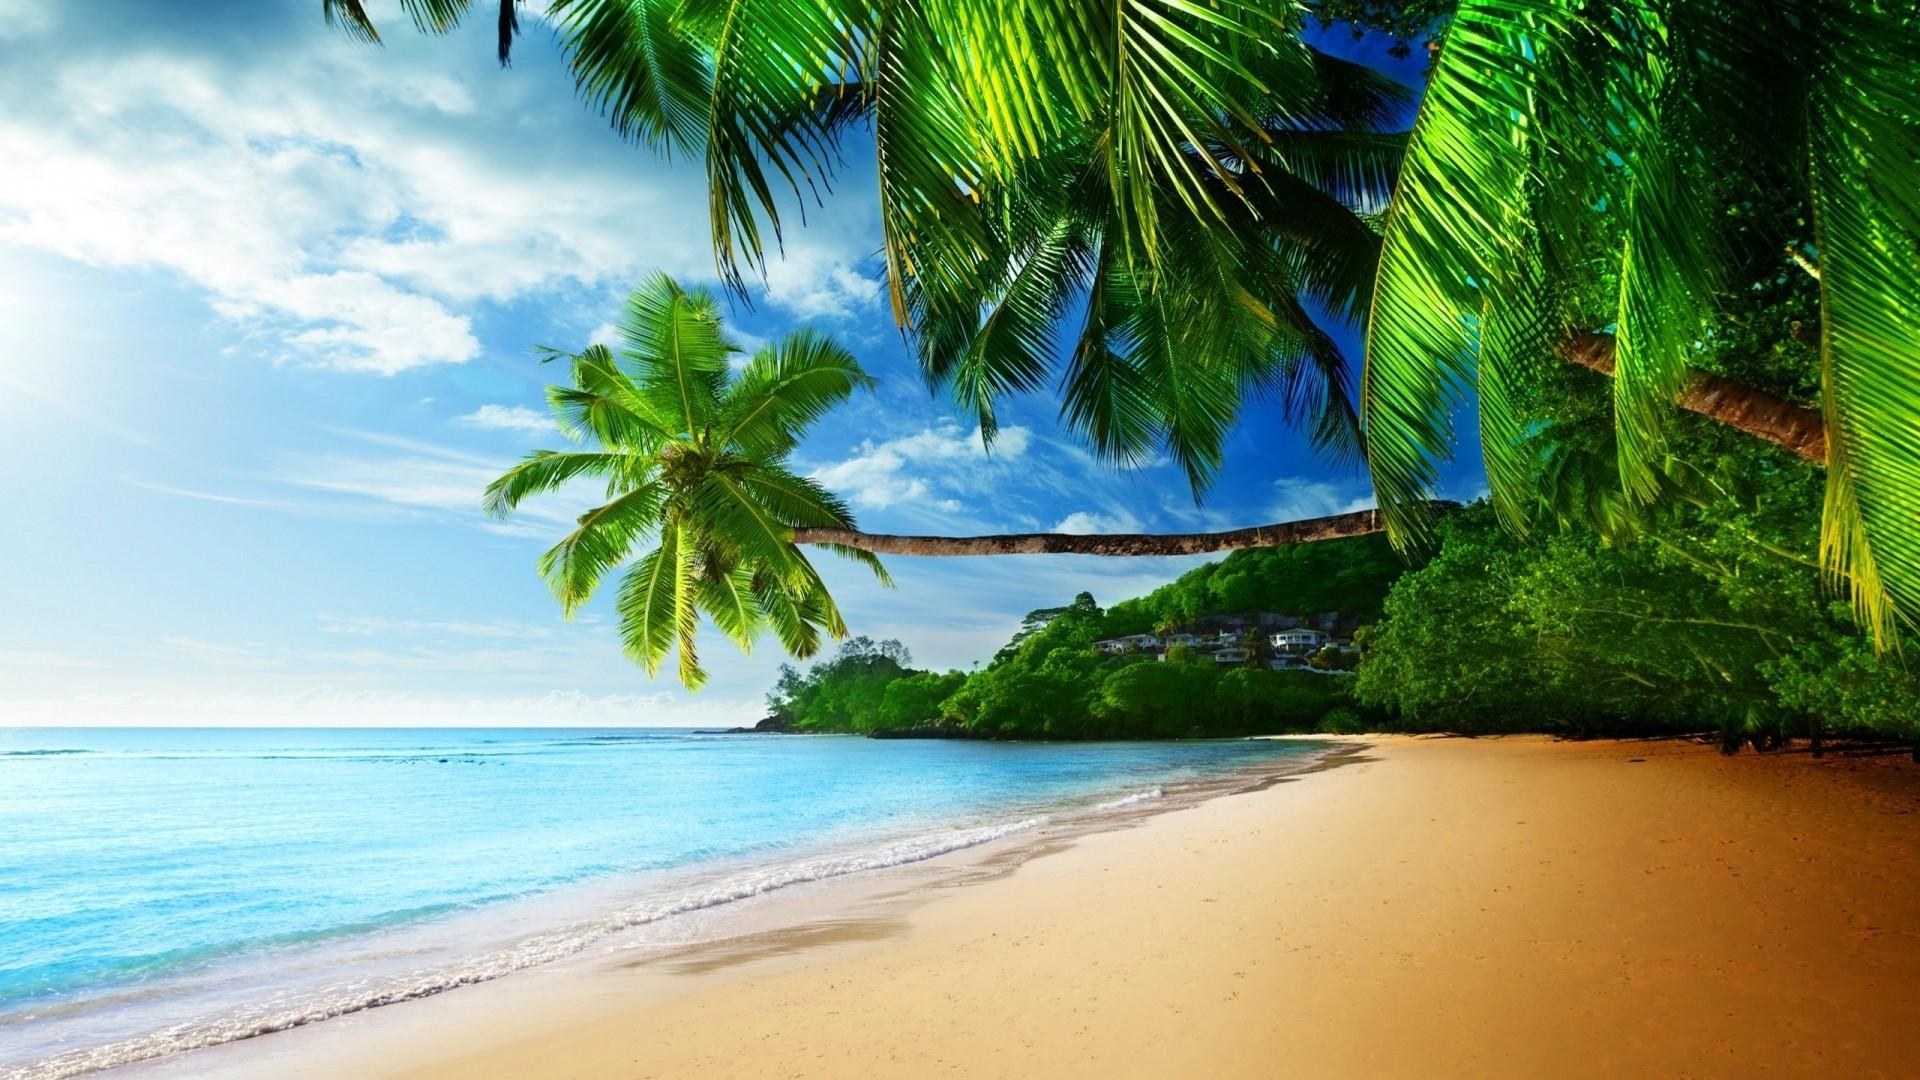 Tropical Beach Screensavers And Wallpaper: Tropical Waves Screensavers And Wallpaper (55+ Images